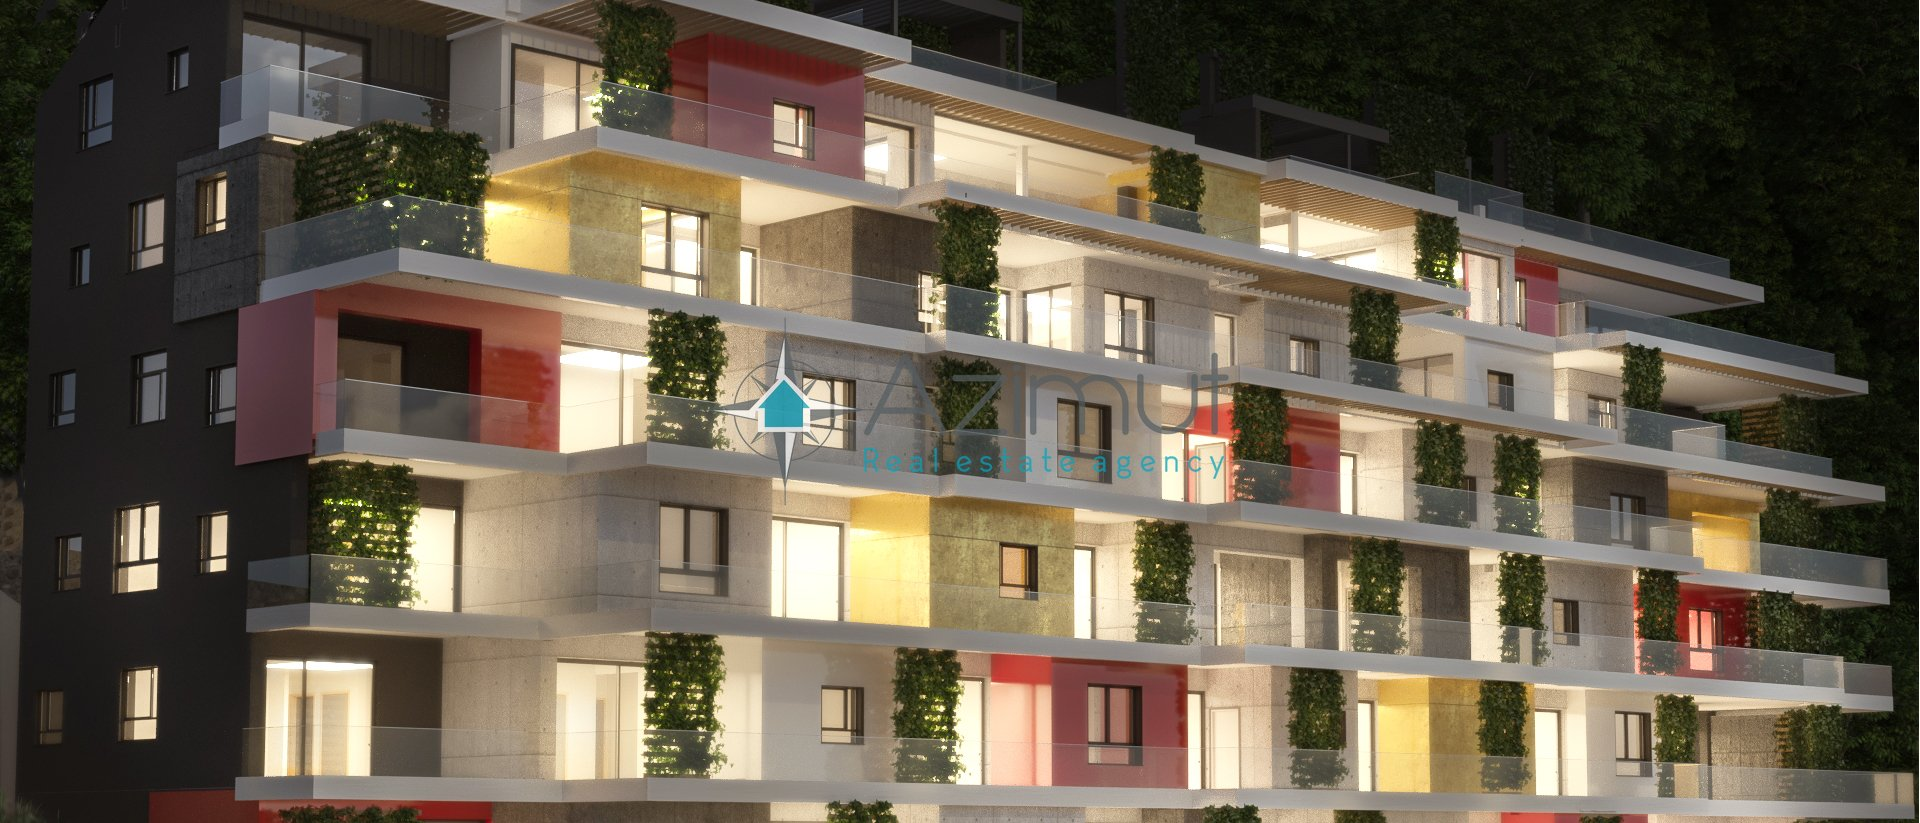 Wohnung, 362 m2, Verkauf, Opatija